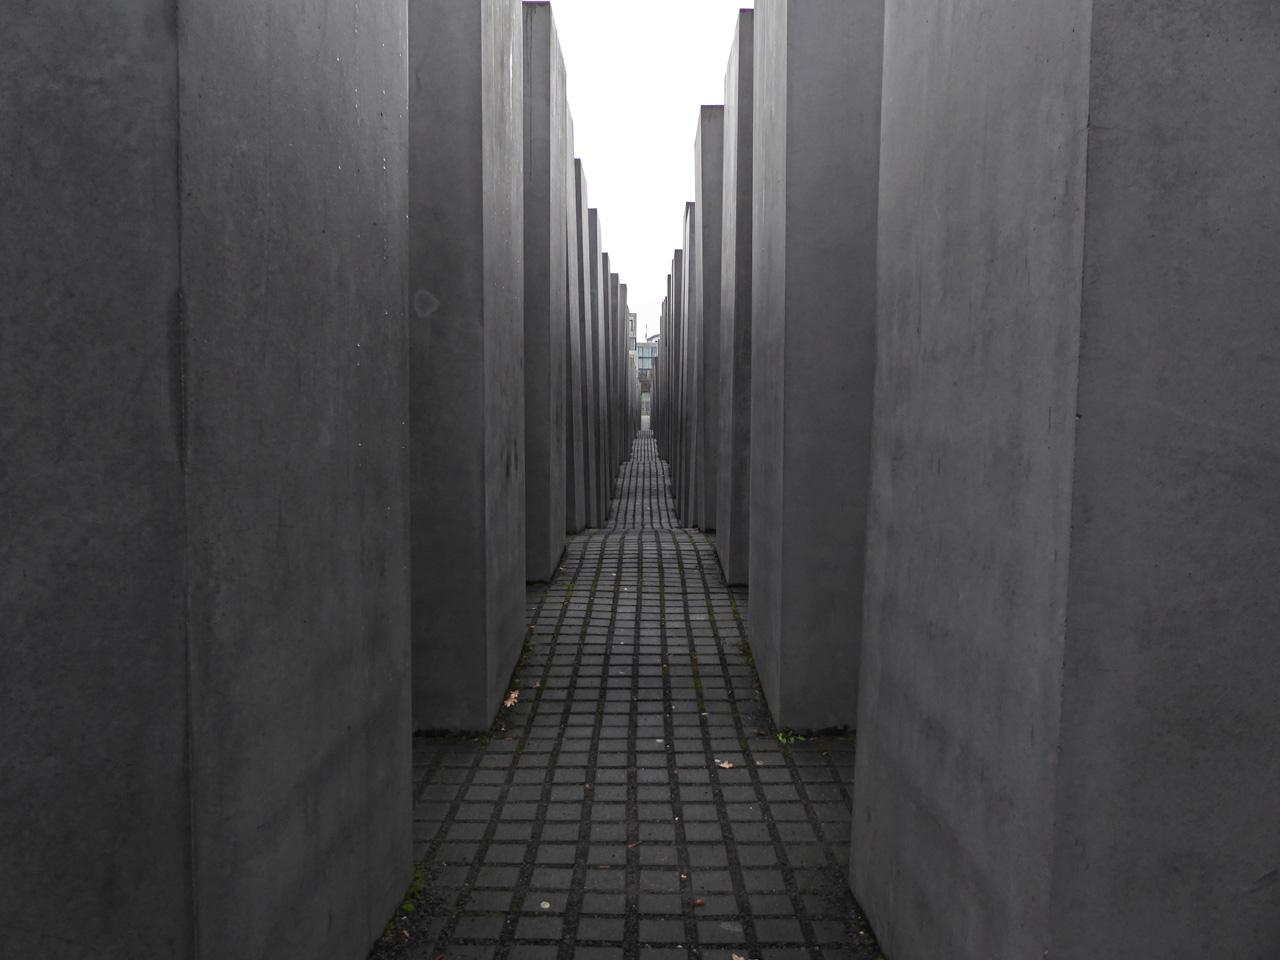 Berlin-memorial-Eisenman Memorial to the Murdered Jews of Europe - Peter Eisenman